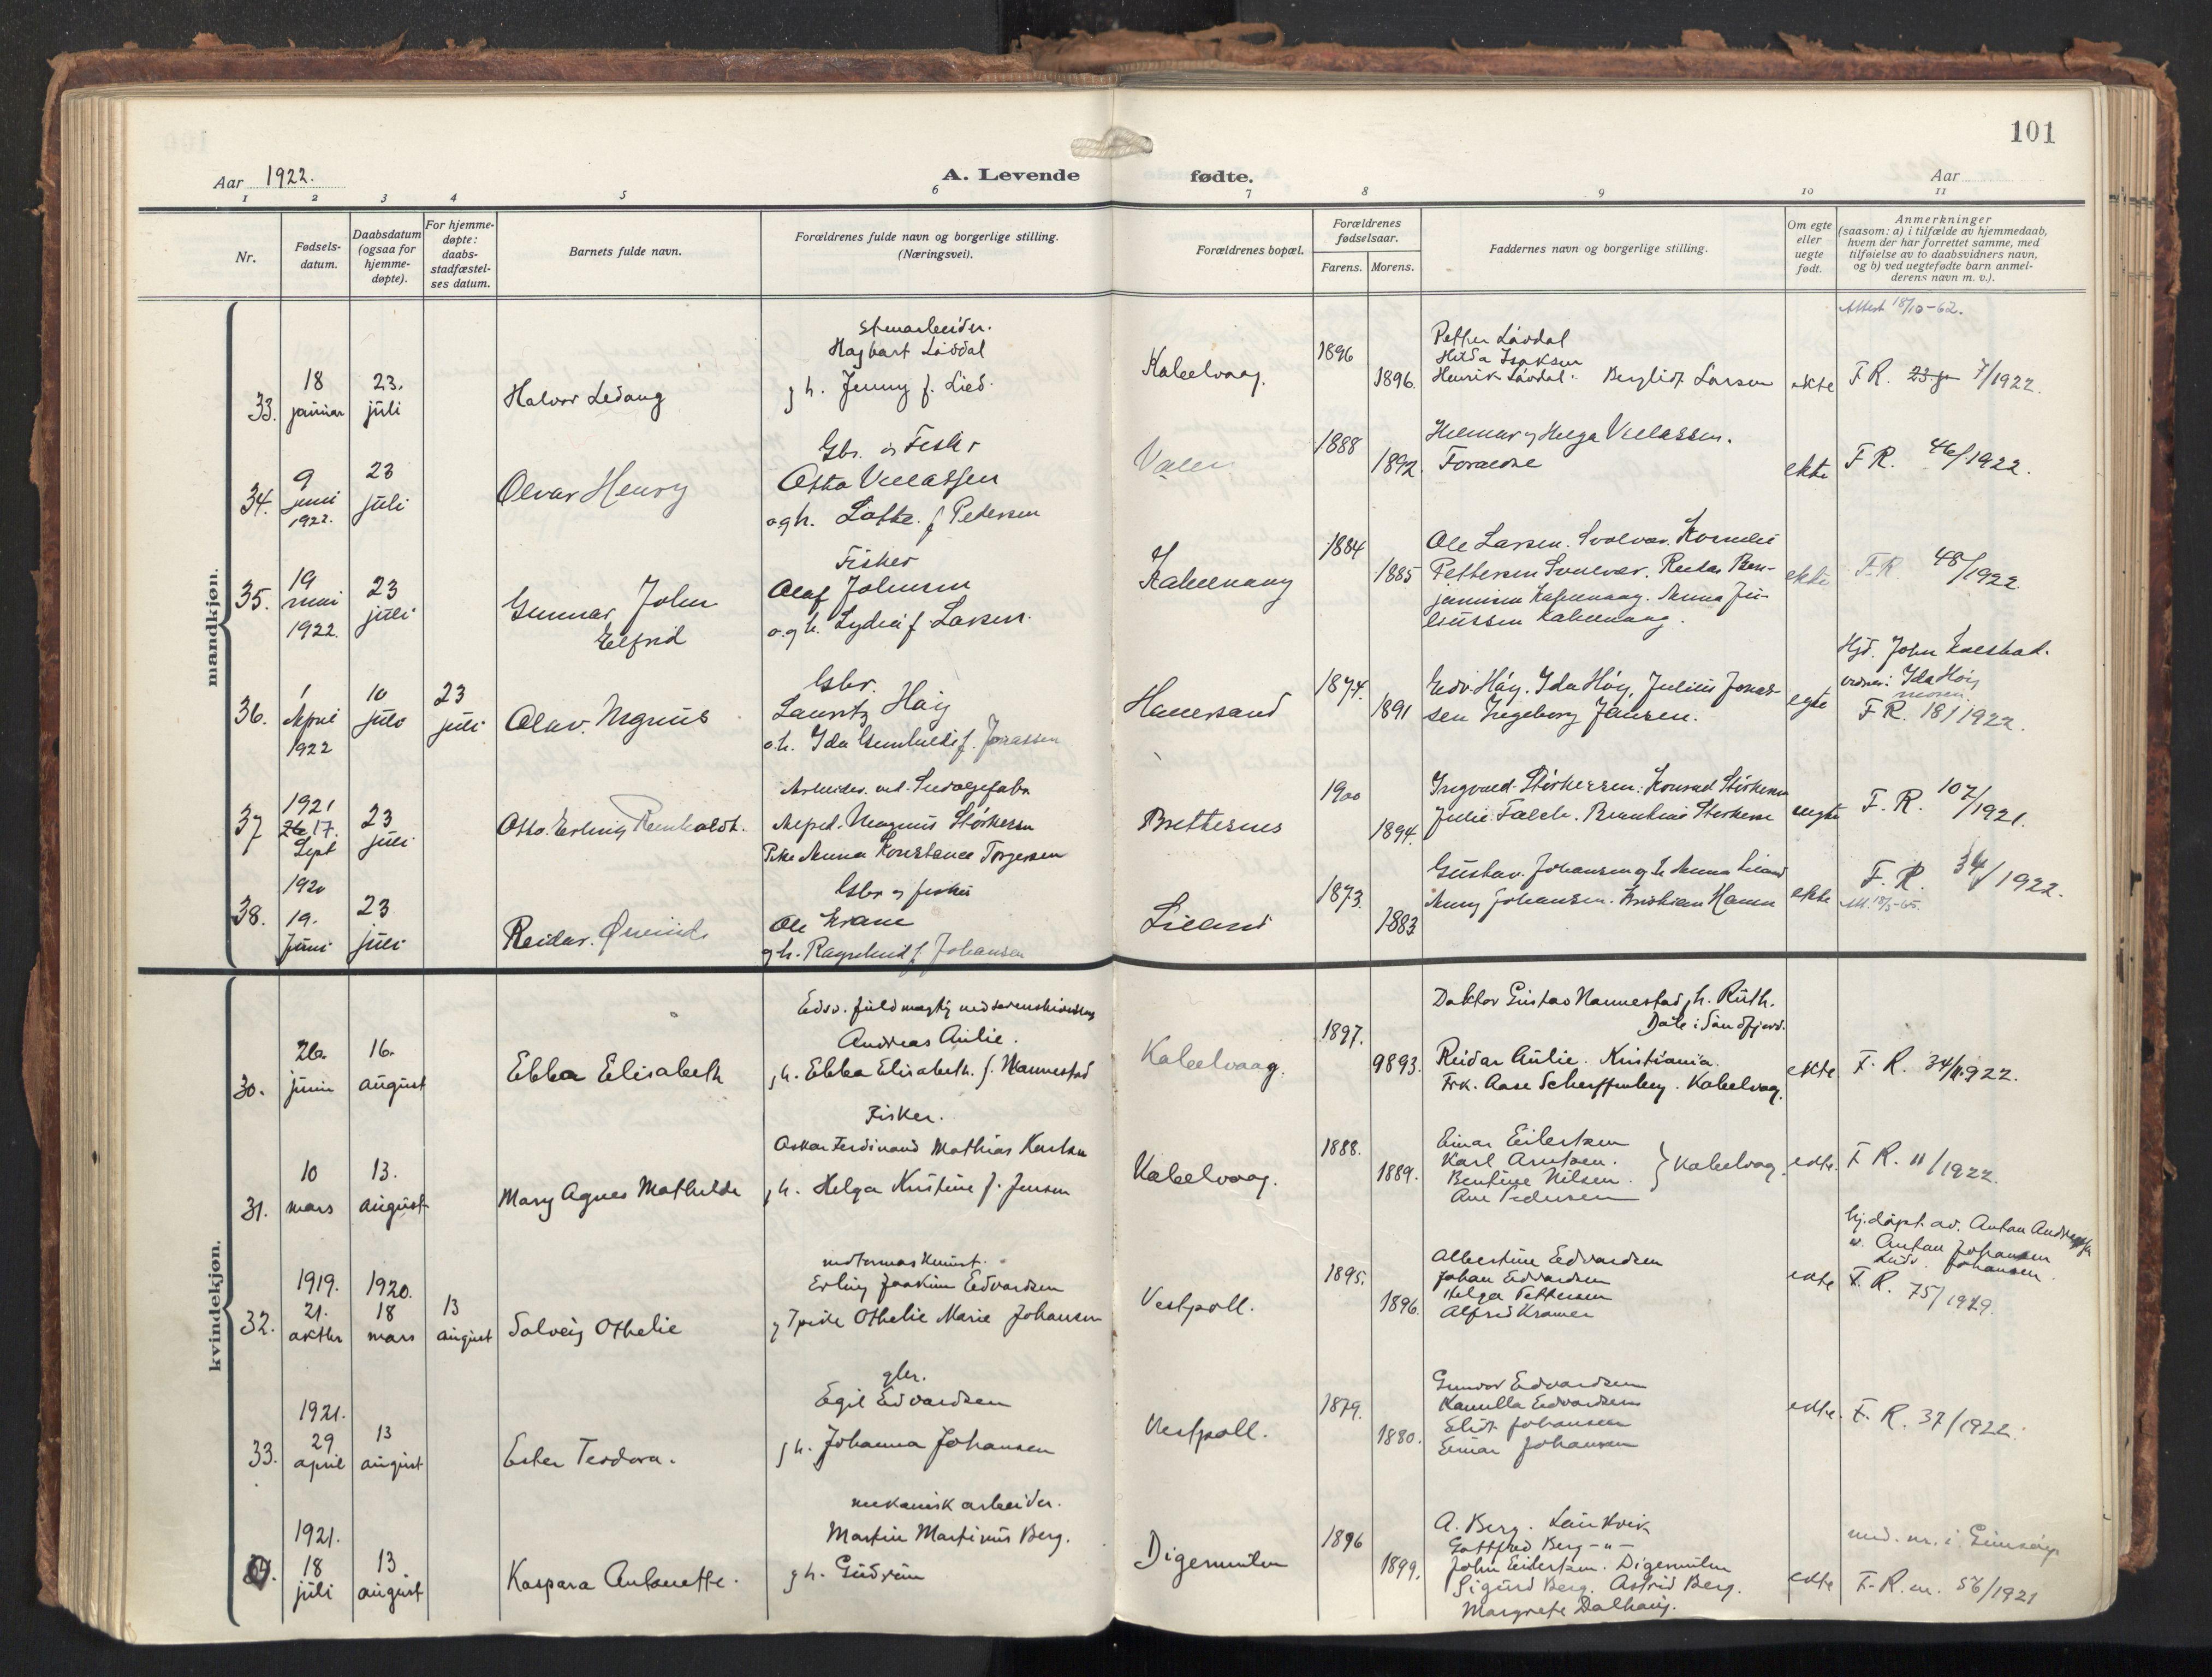 SAT, Ministerialprotokoller, klokkerbøker og fødselsregistre - Nordland, 874/L1064: Ministerialbok nr. 874A08, 1915-1926, s. 101